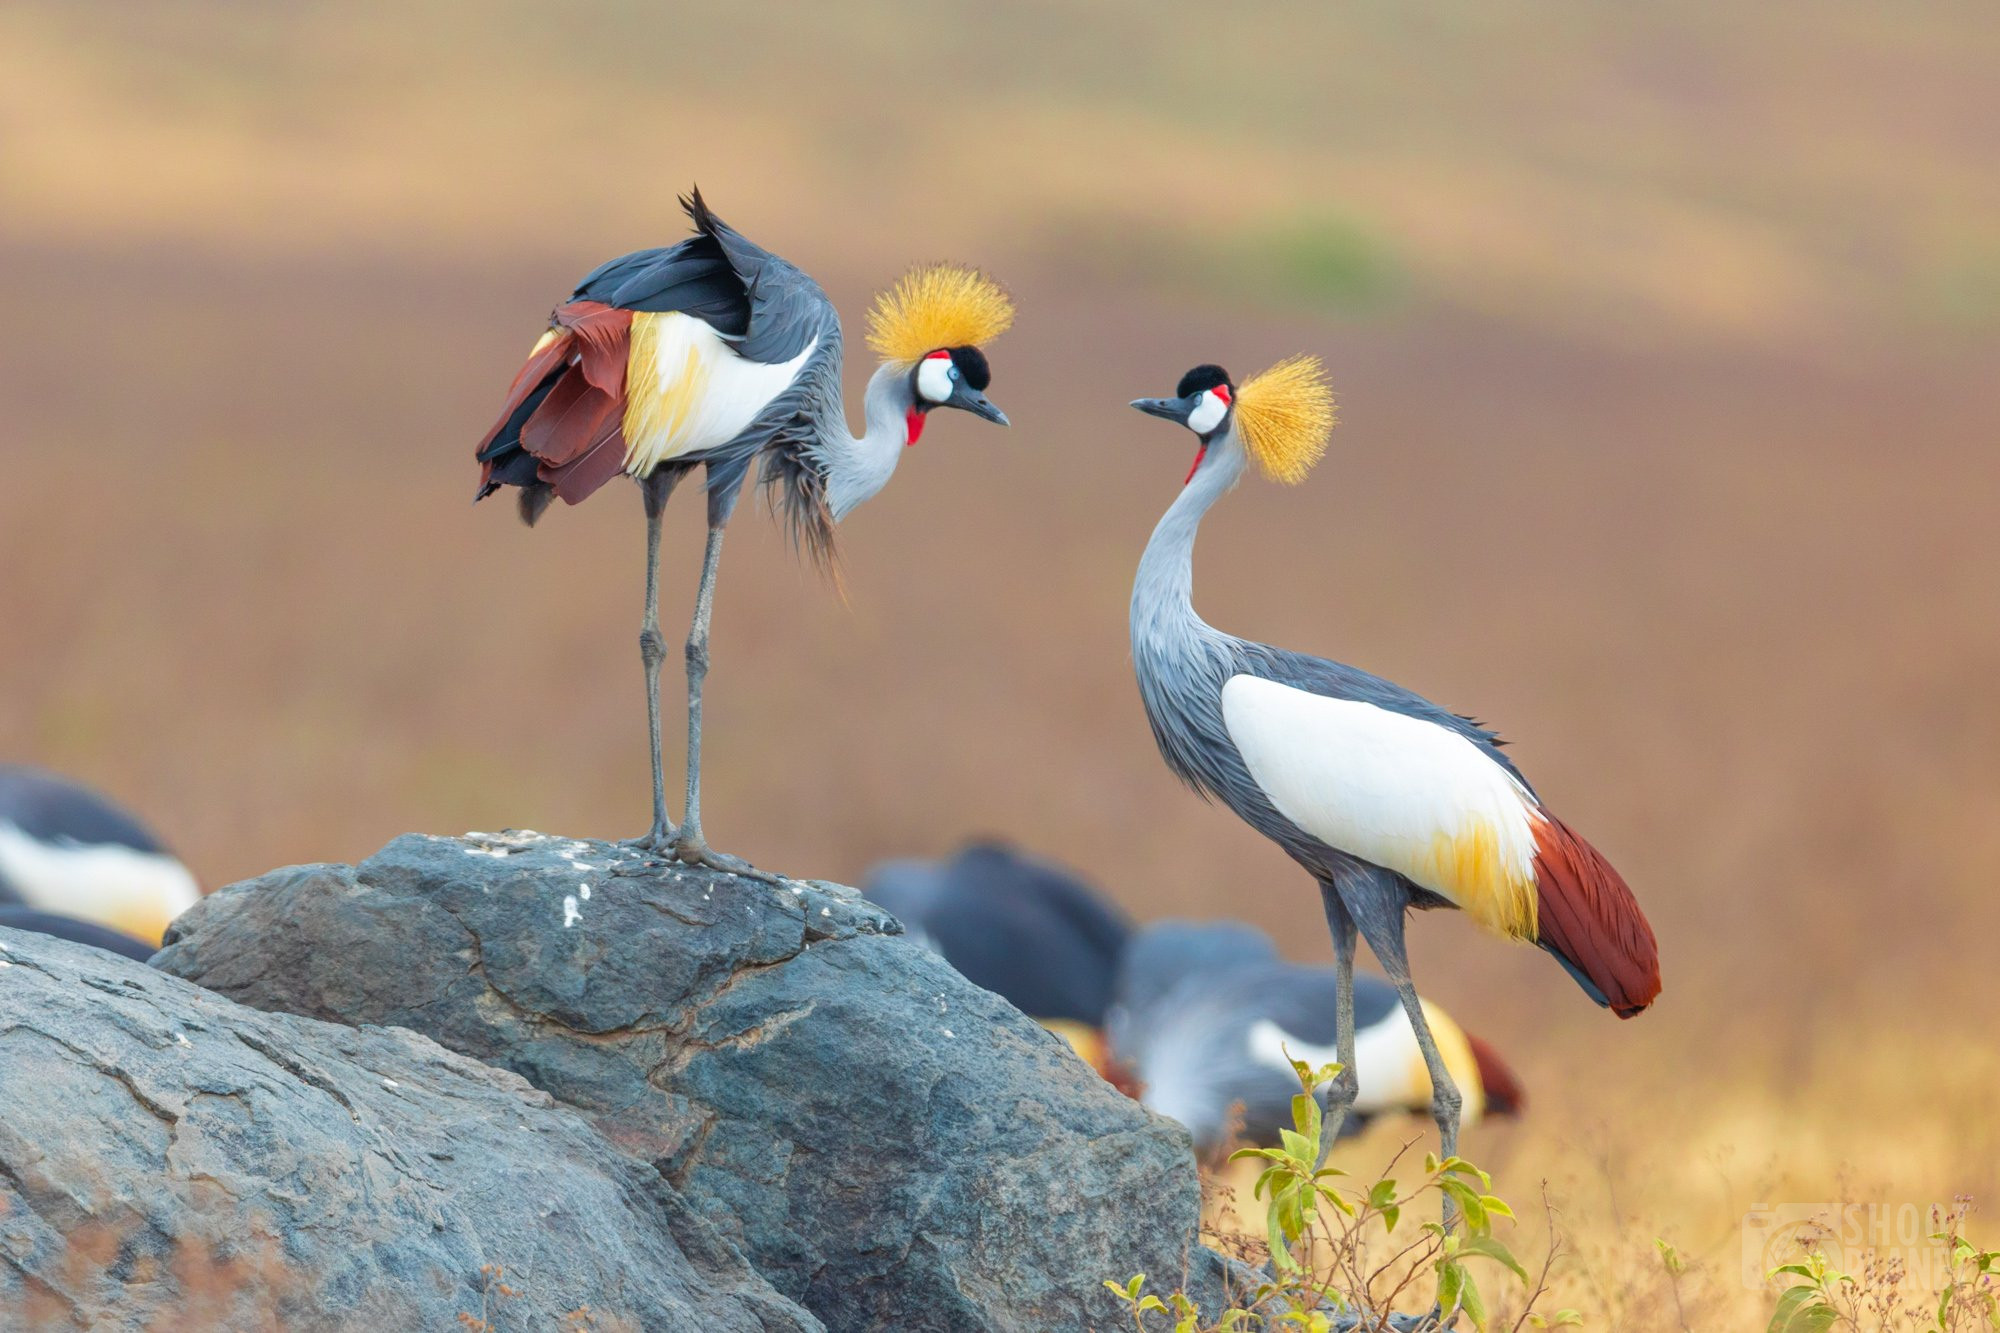 Black-crowned crane birds, Ngorongoro crater, Tanzania